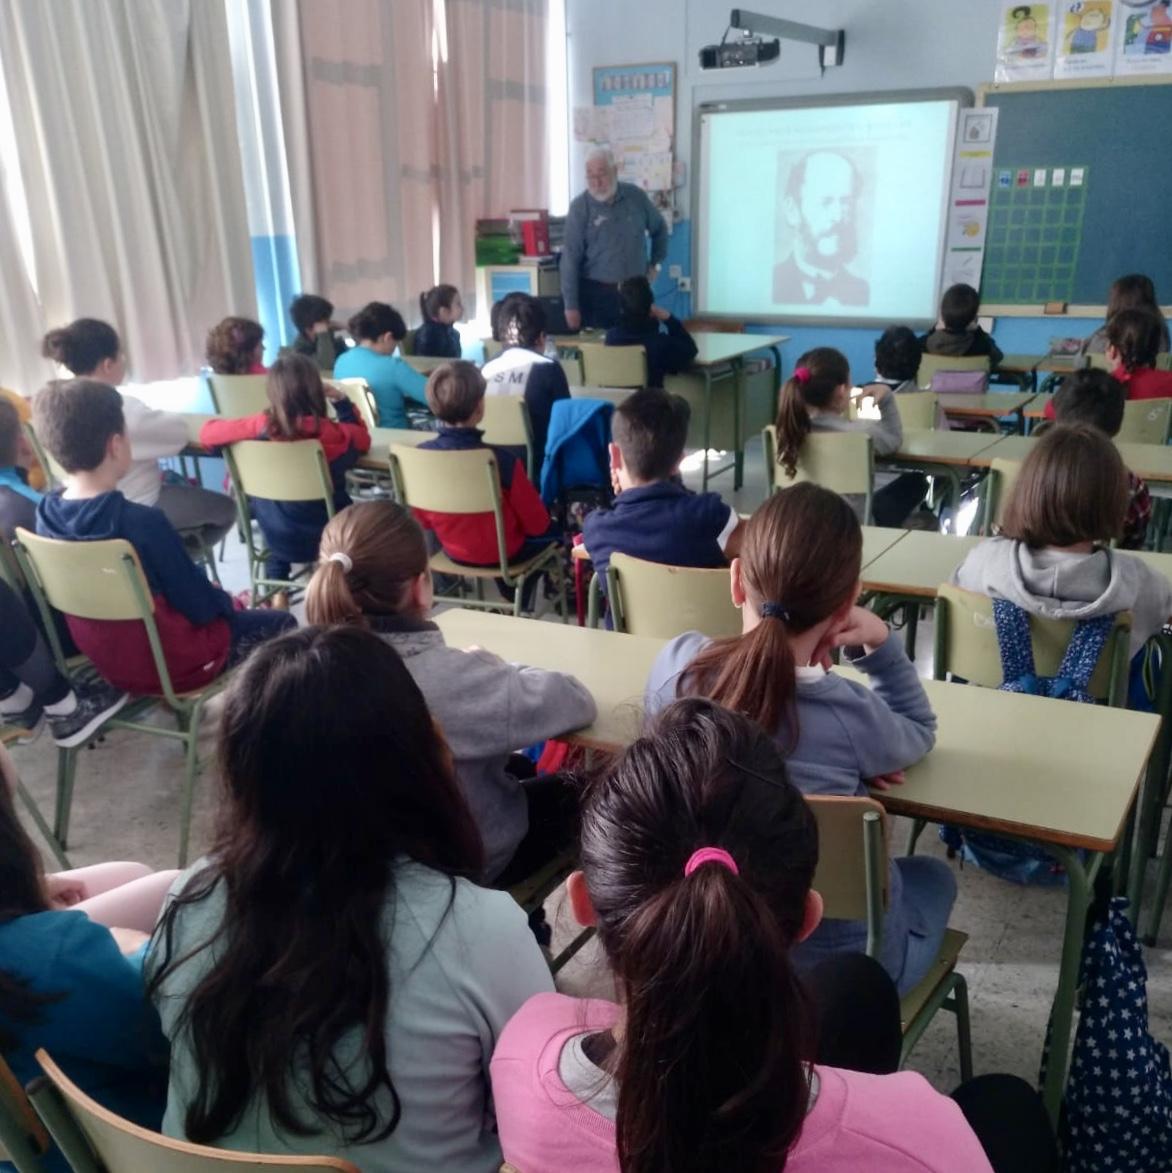 Ovación escolar en Ribadesella a Jesús Manuel Fernández Malvárez